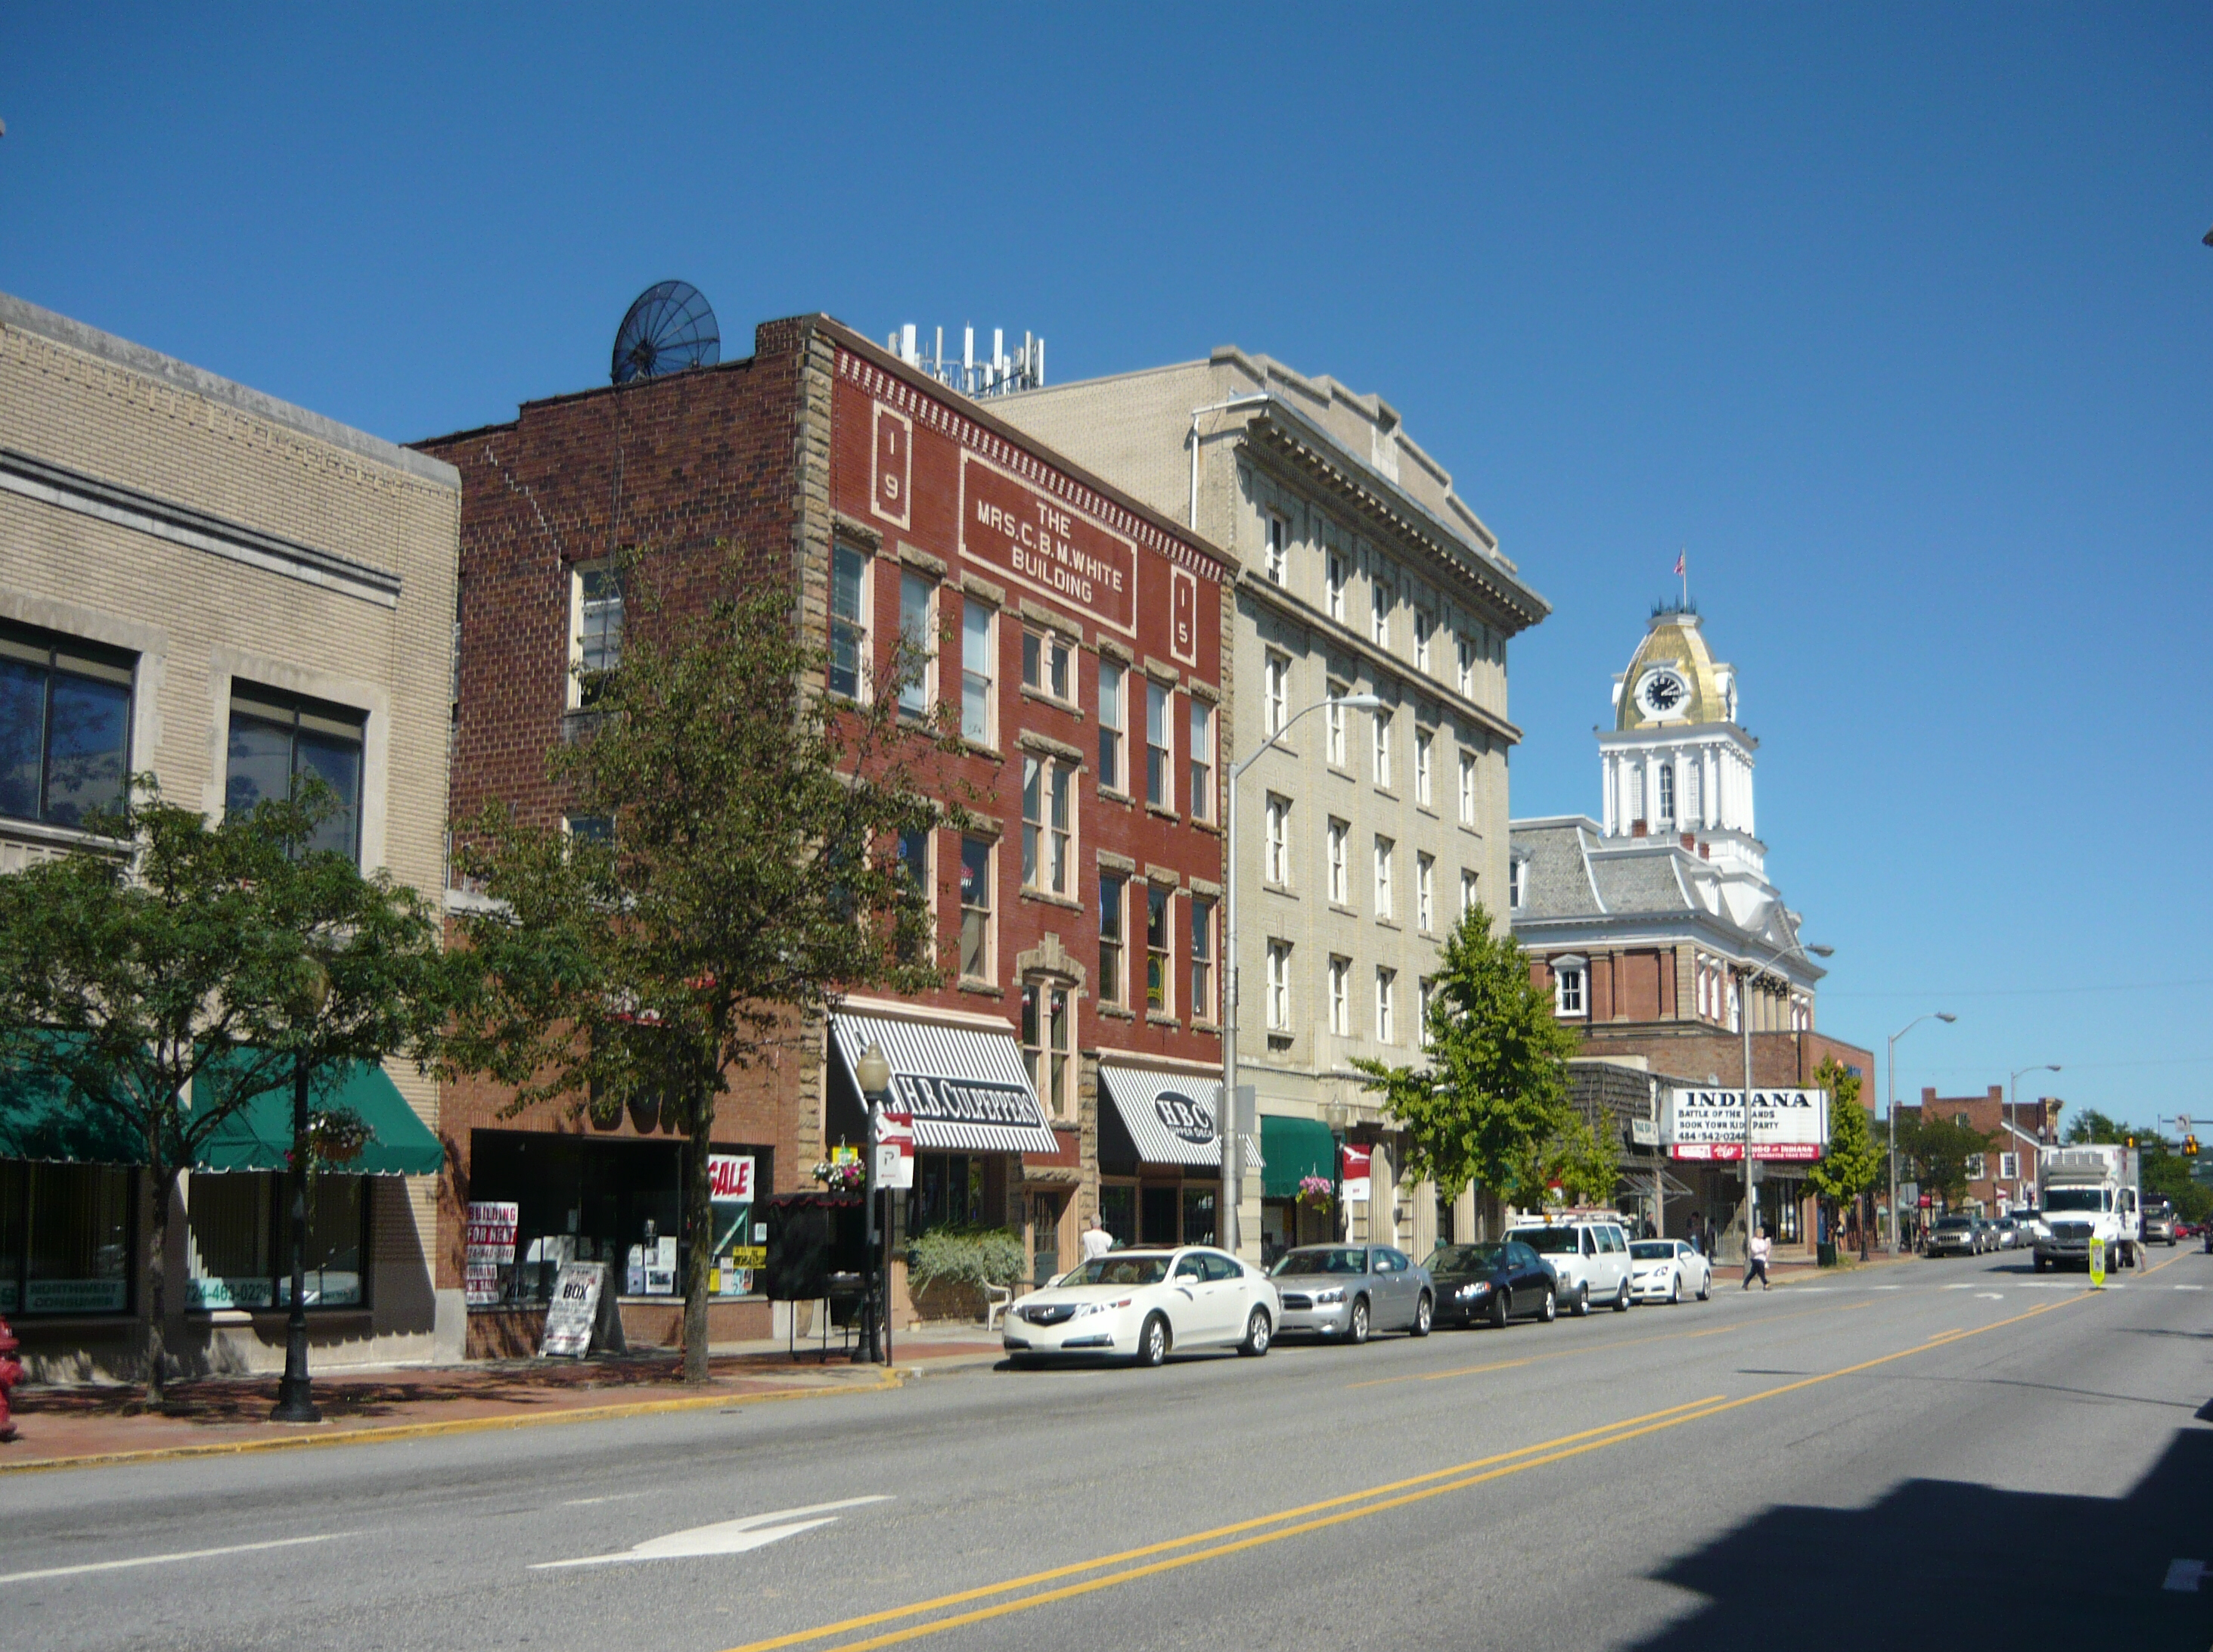 Indiana County